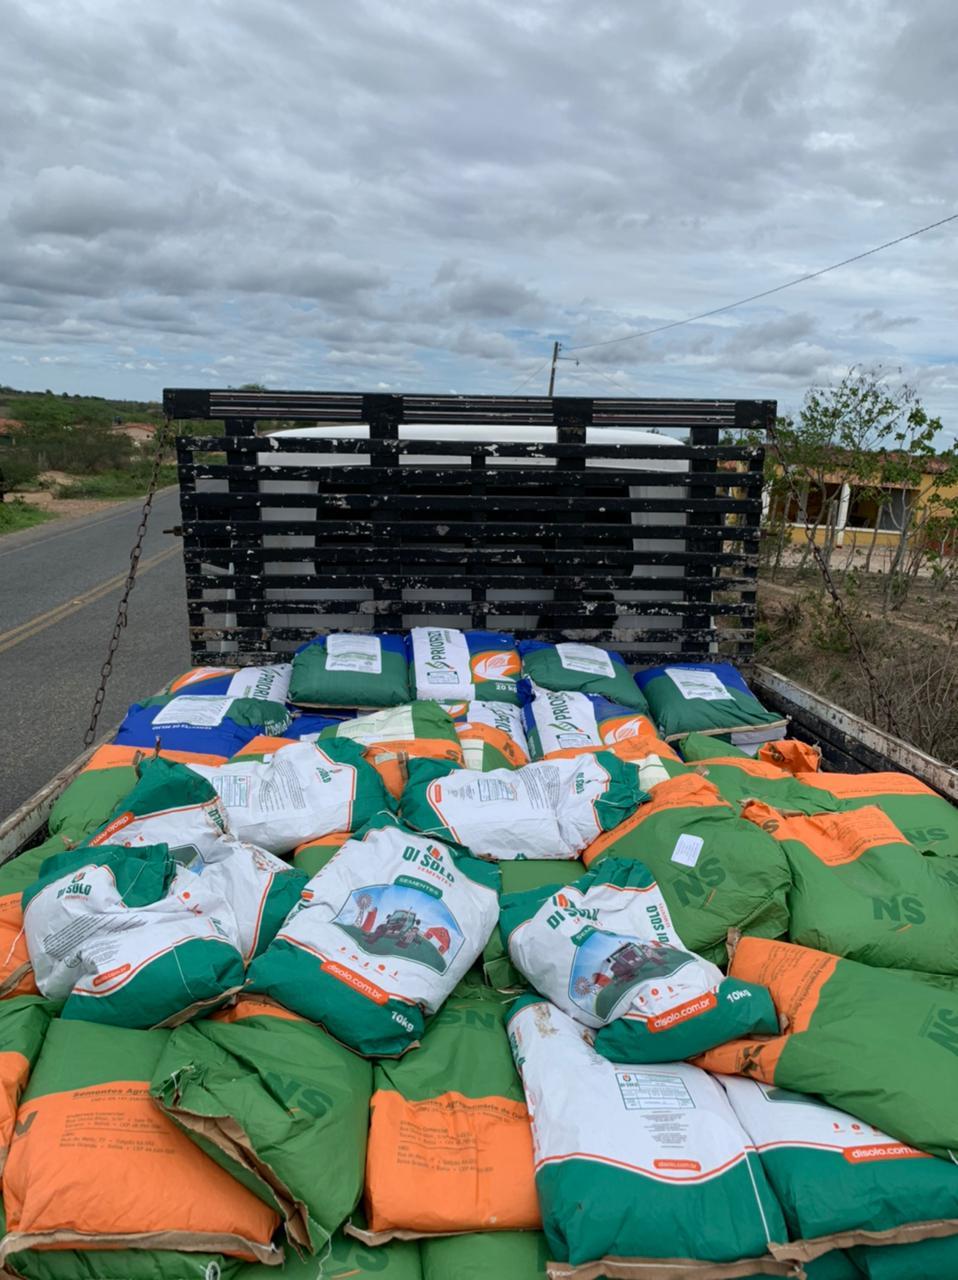 Agricultores de Solânea receberam mais de 4 mil quilos de sementes